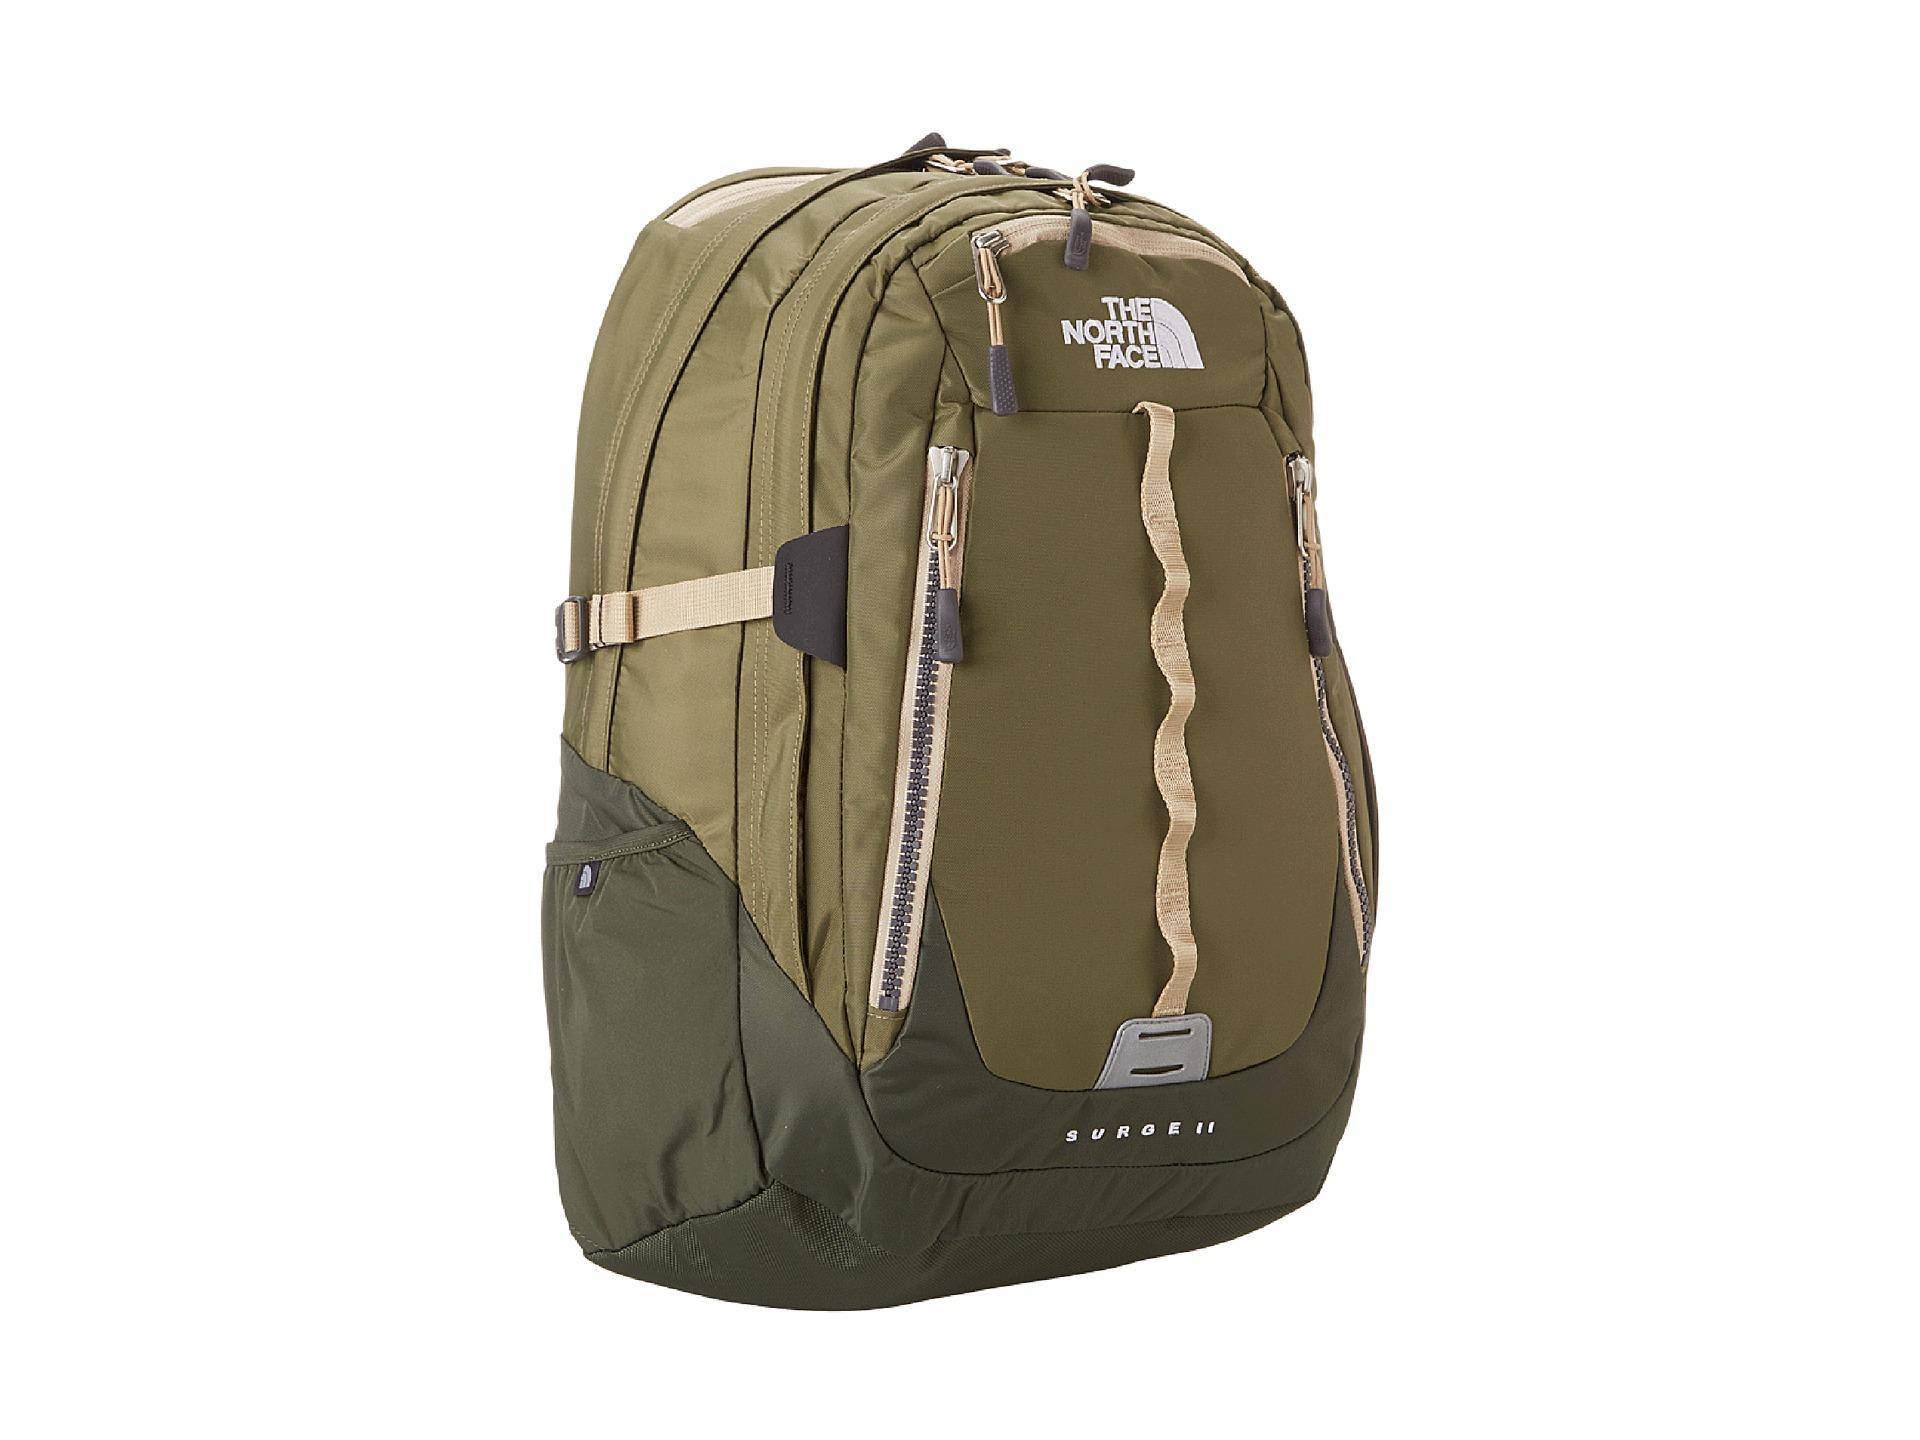 46c9c6c342b The North Face Surge 2 Laptop Backpack- Fenix Toulouse Handball